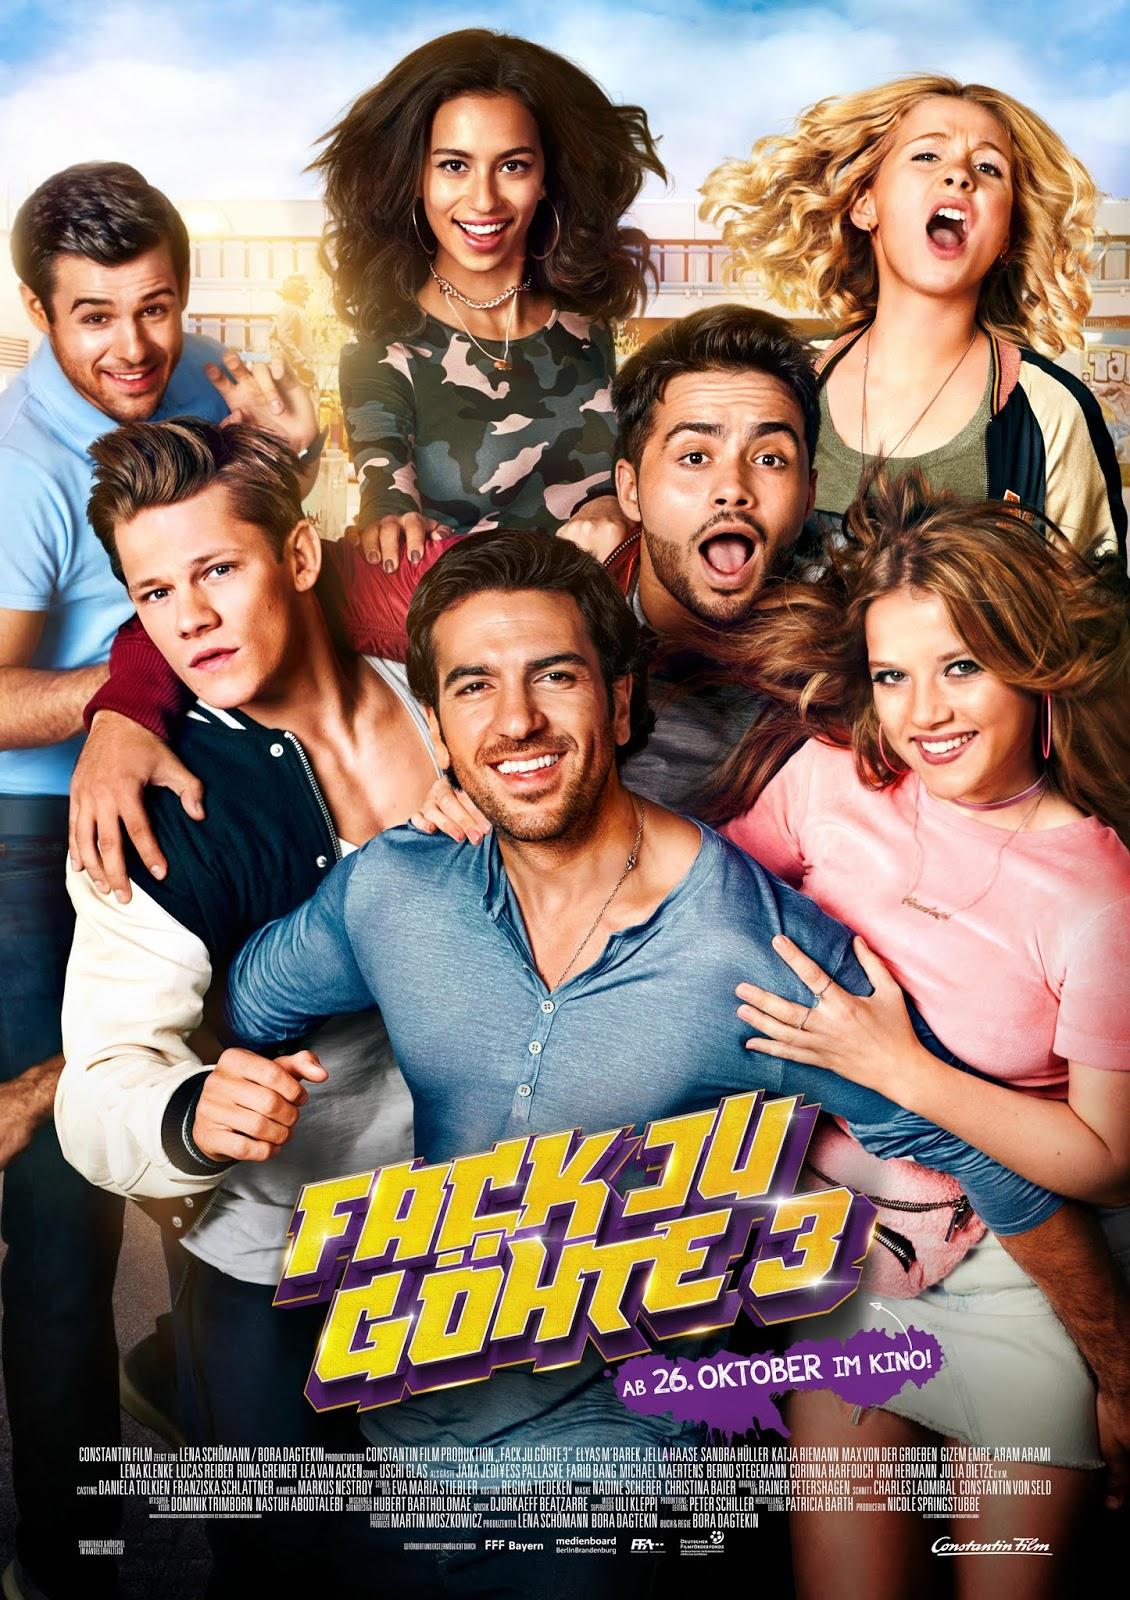 Suck Me Shakespeer 3 2017 Dual Audio Hindi German 720p BluRay Full Movie Free Download